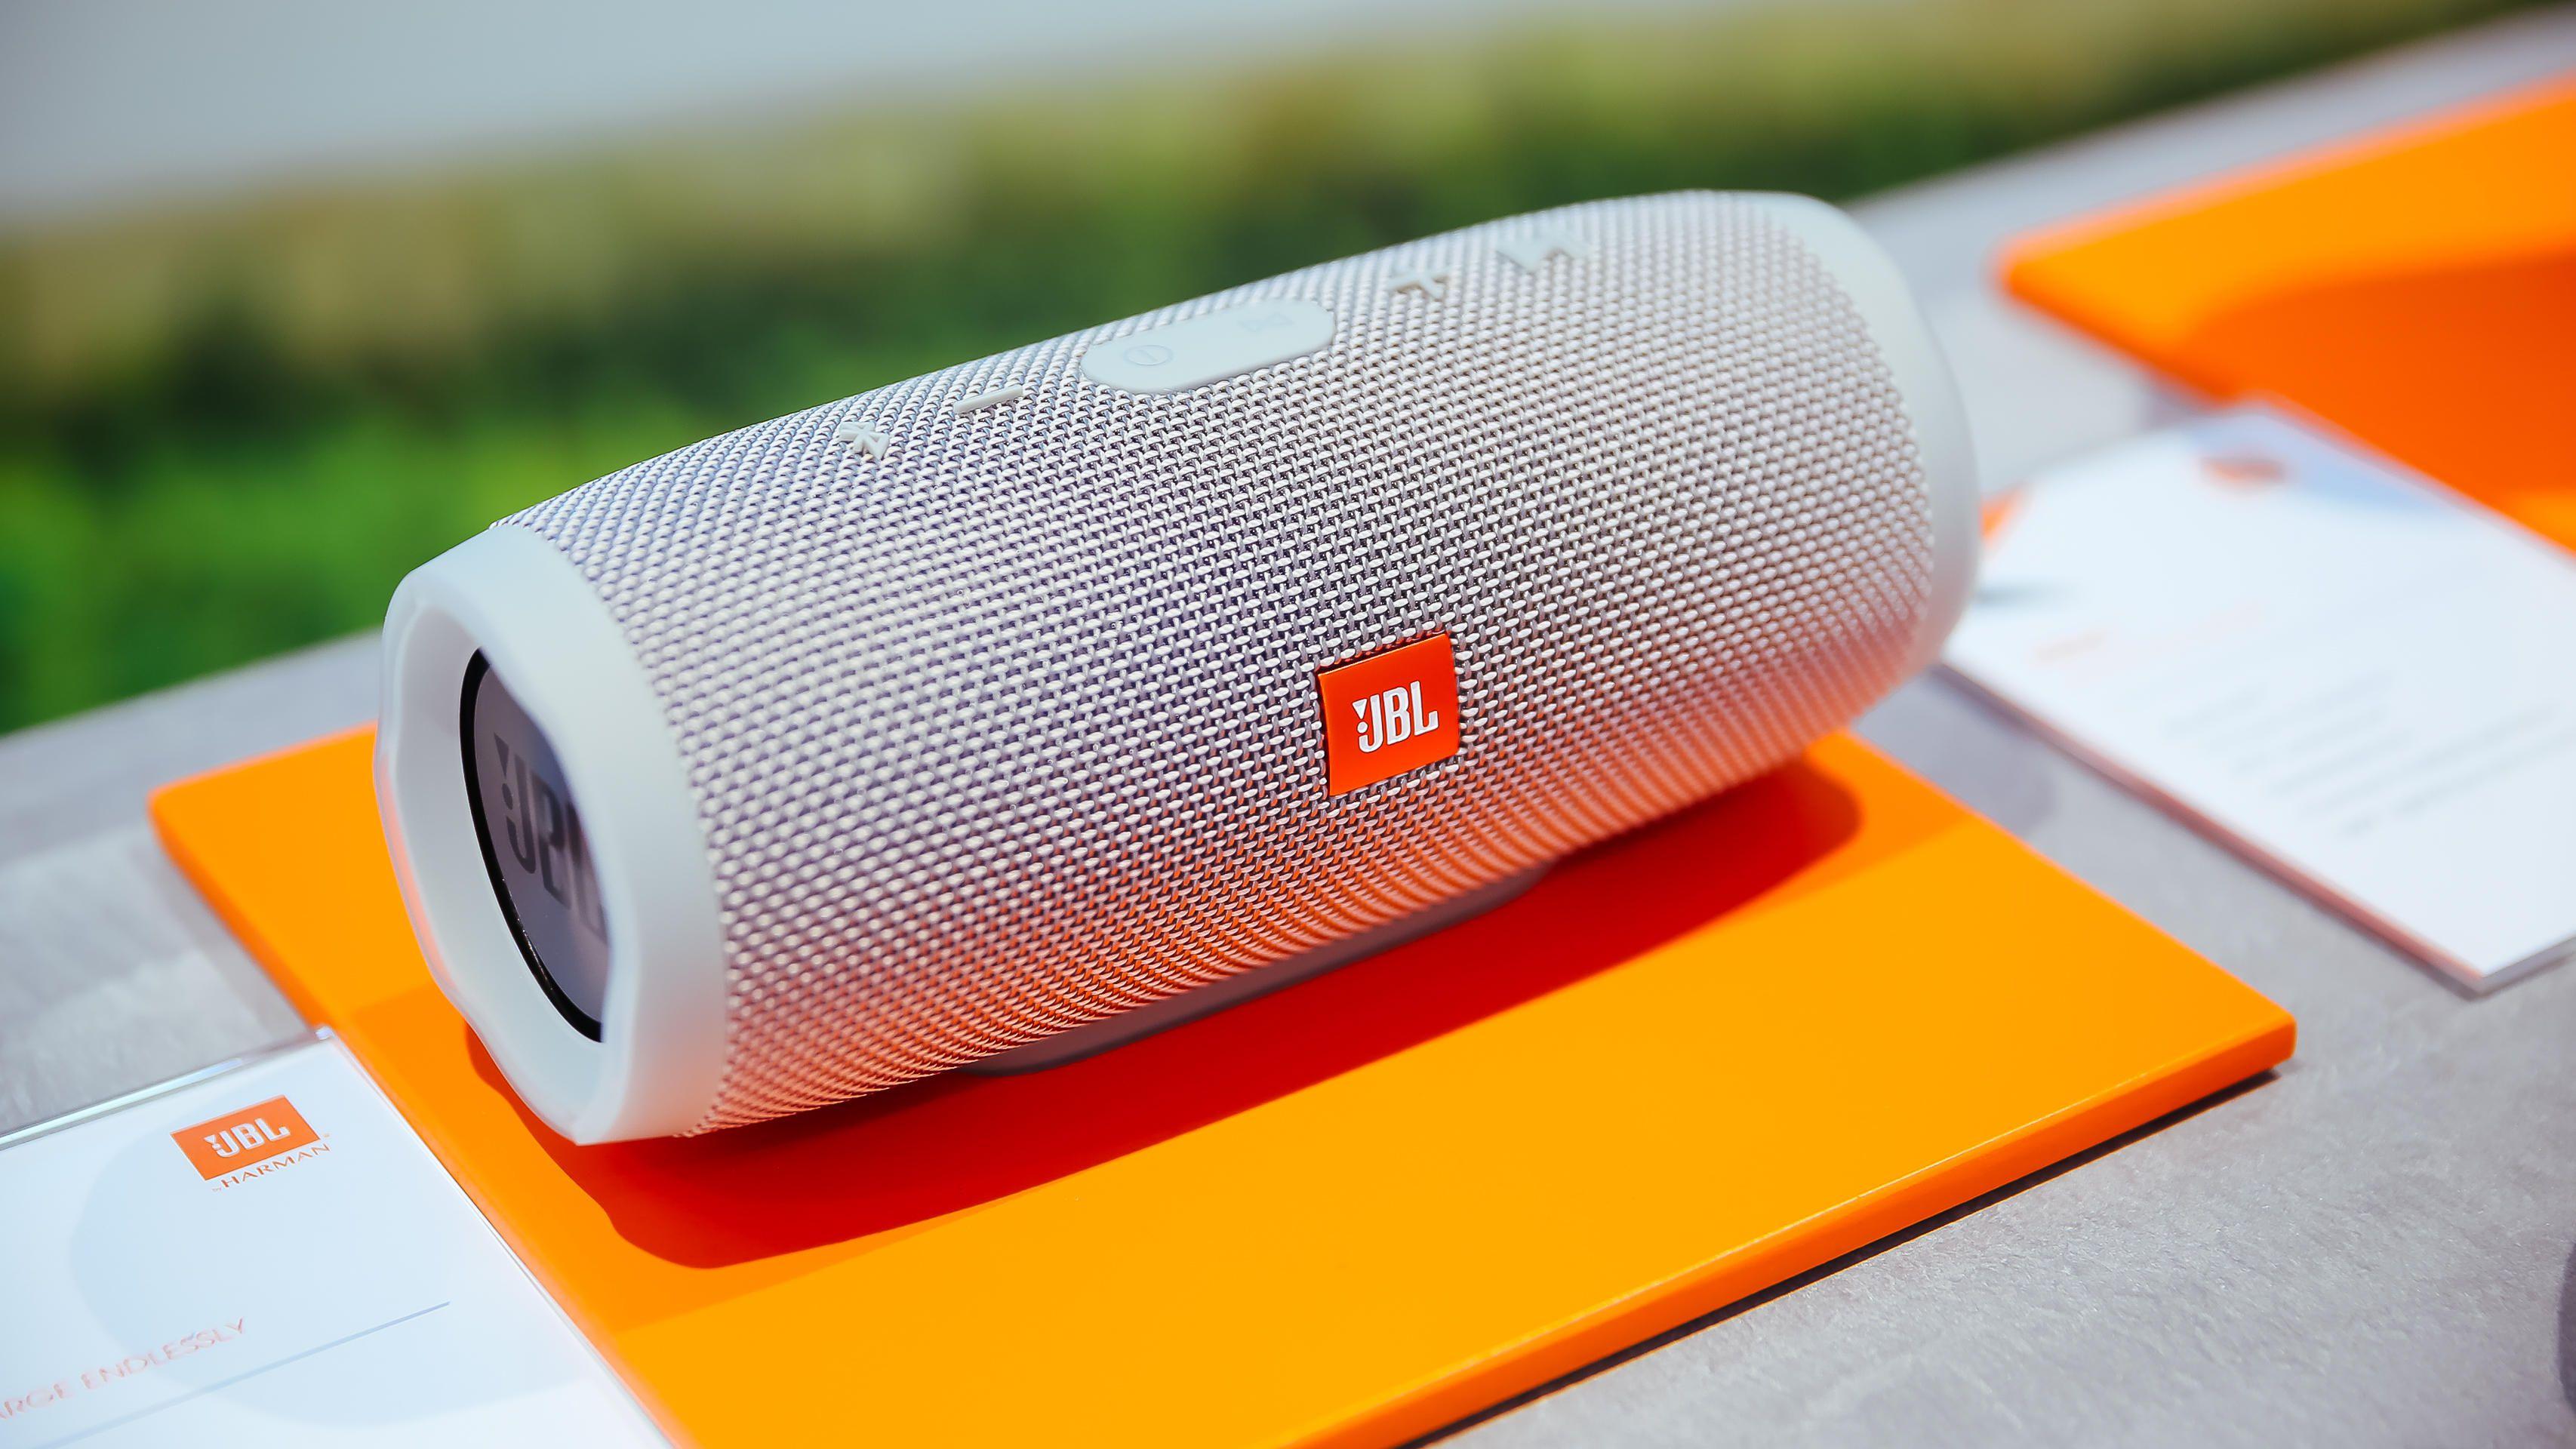 a grey bluetooth speaker on an orange mat